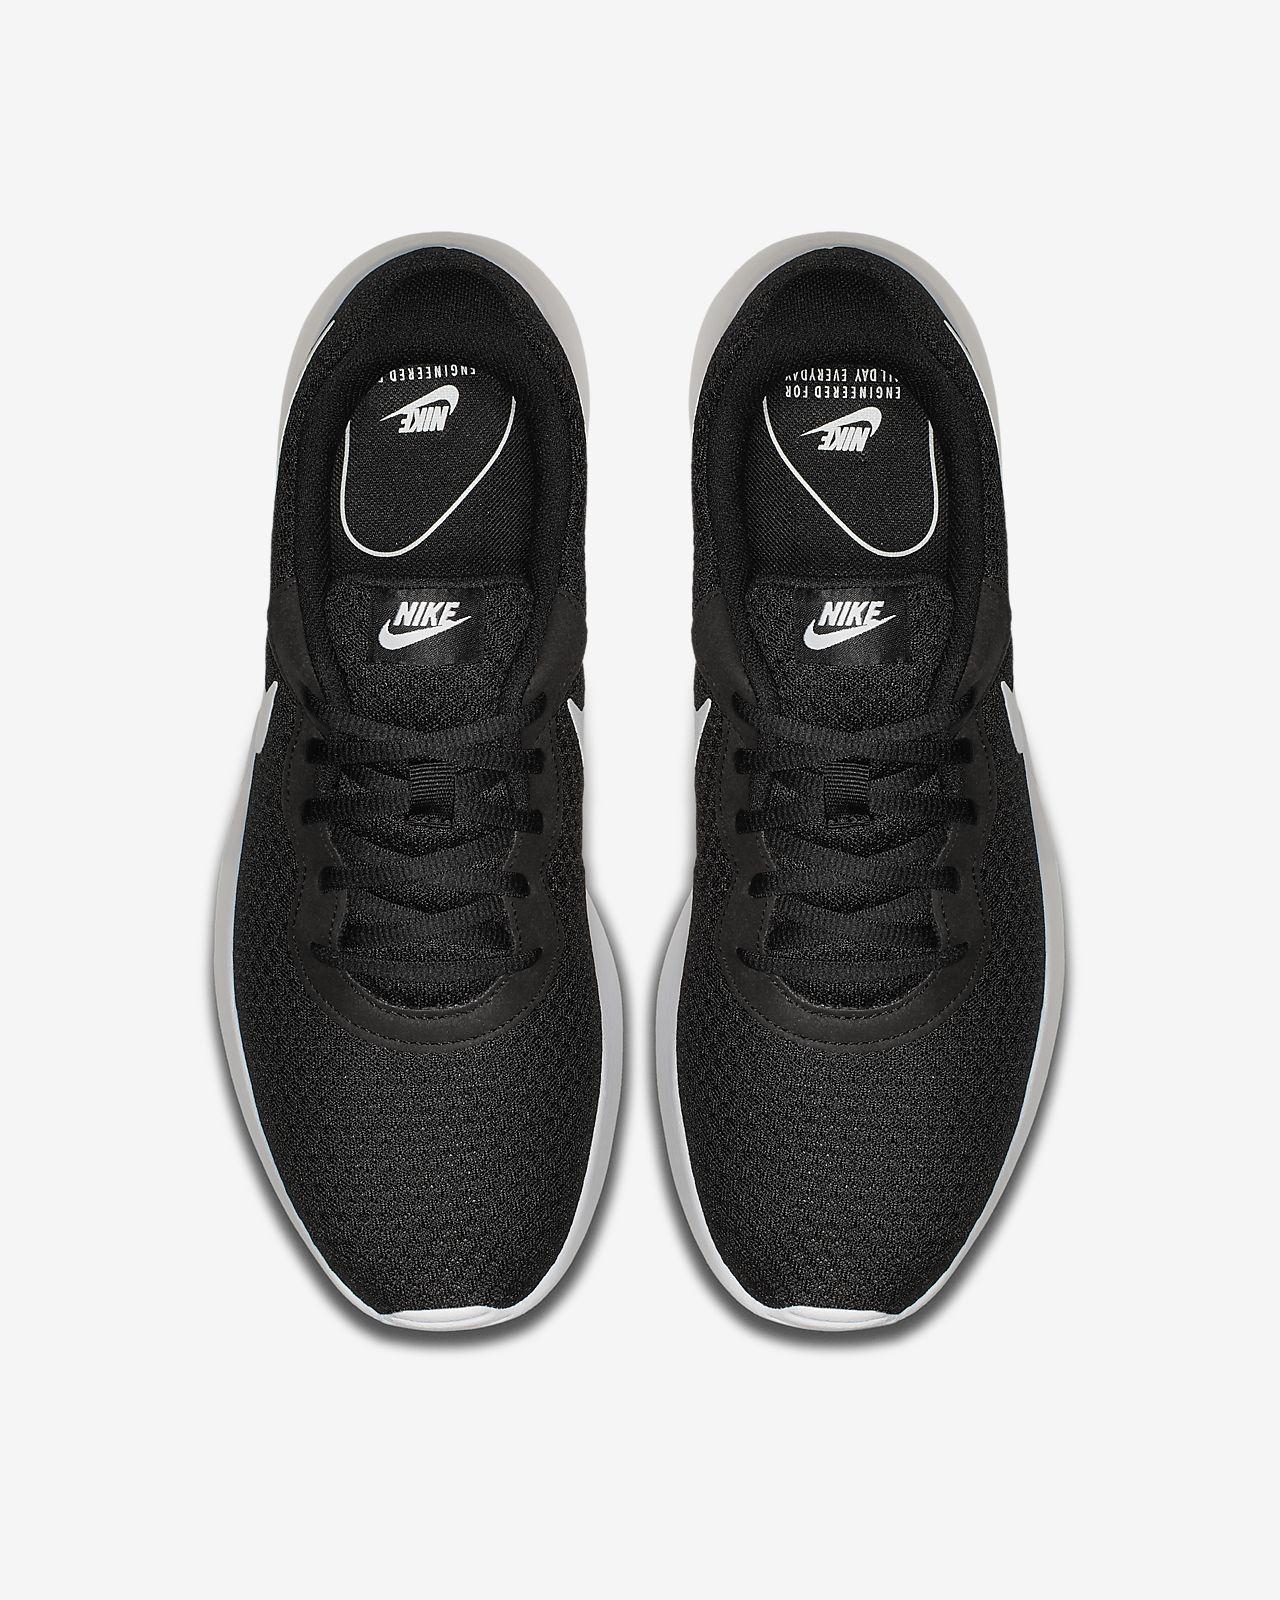 5524889ee956d Calzado para hombre Nike Tanjun. Nike.com MX